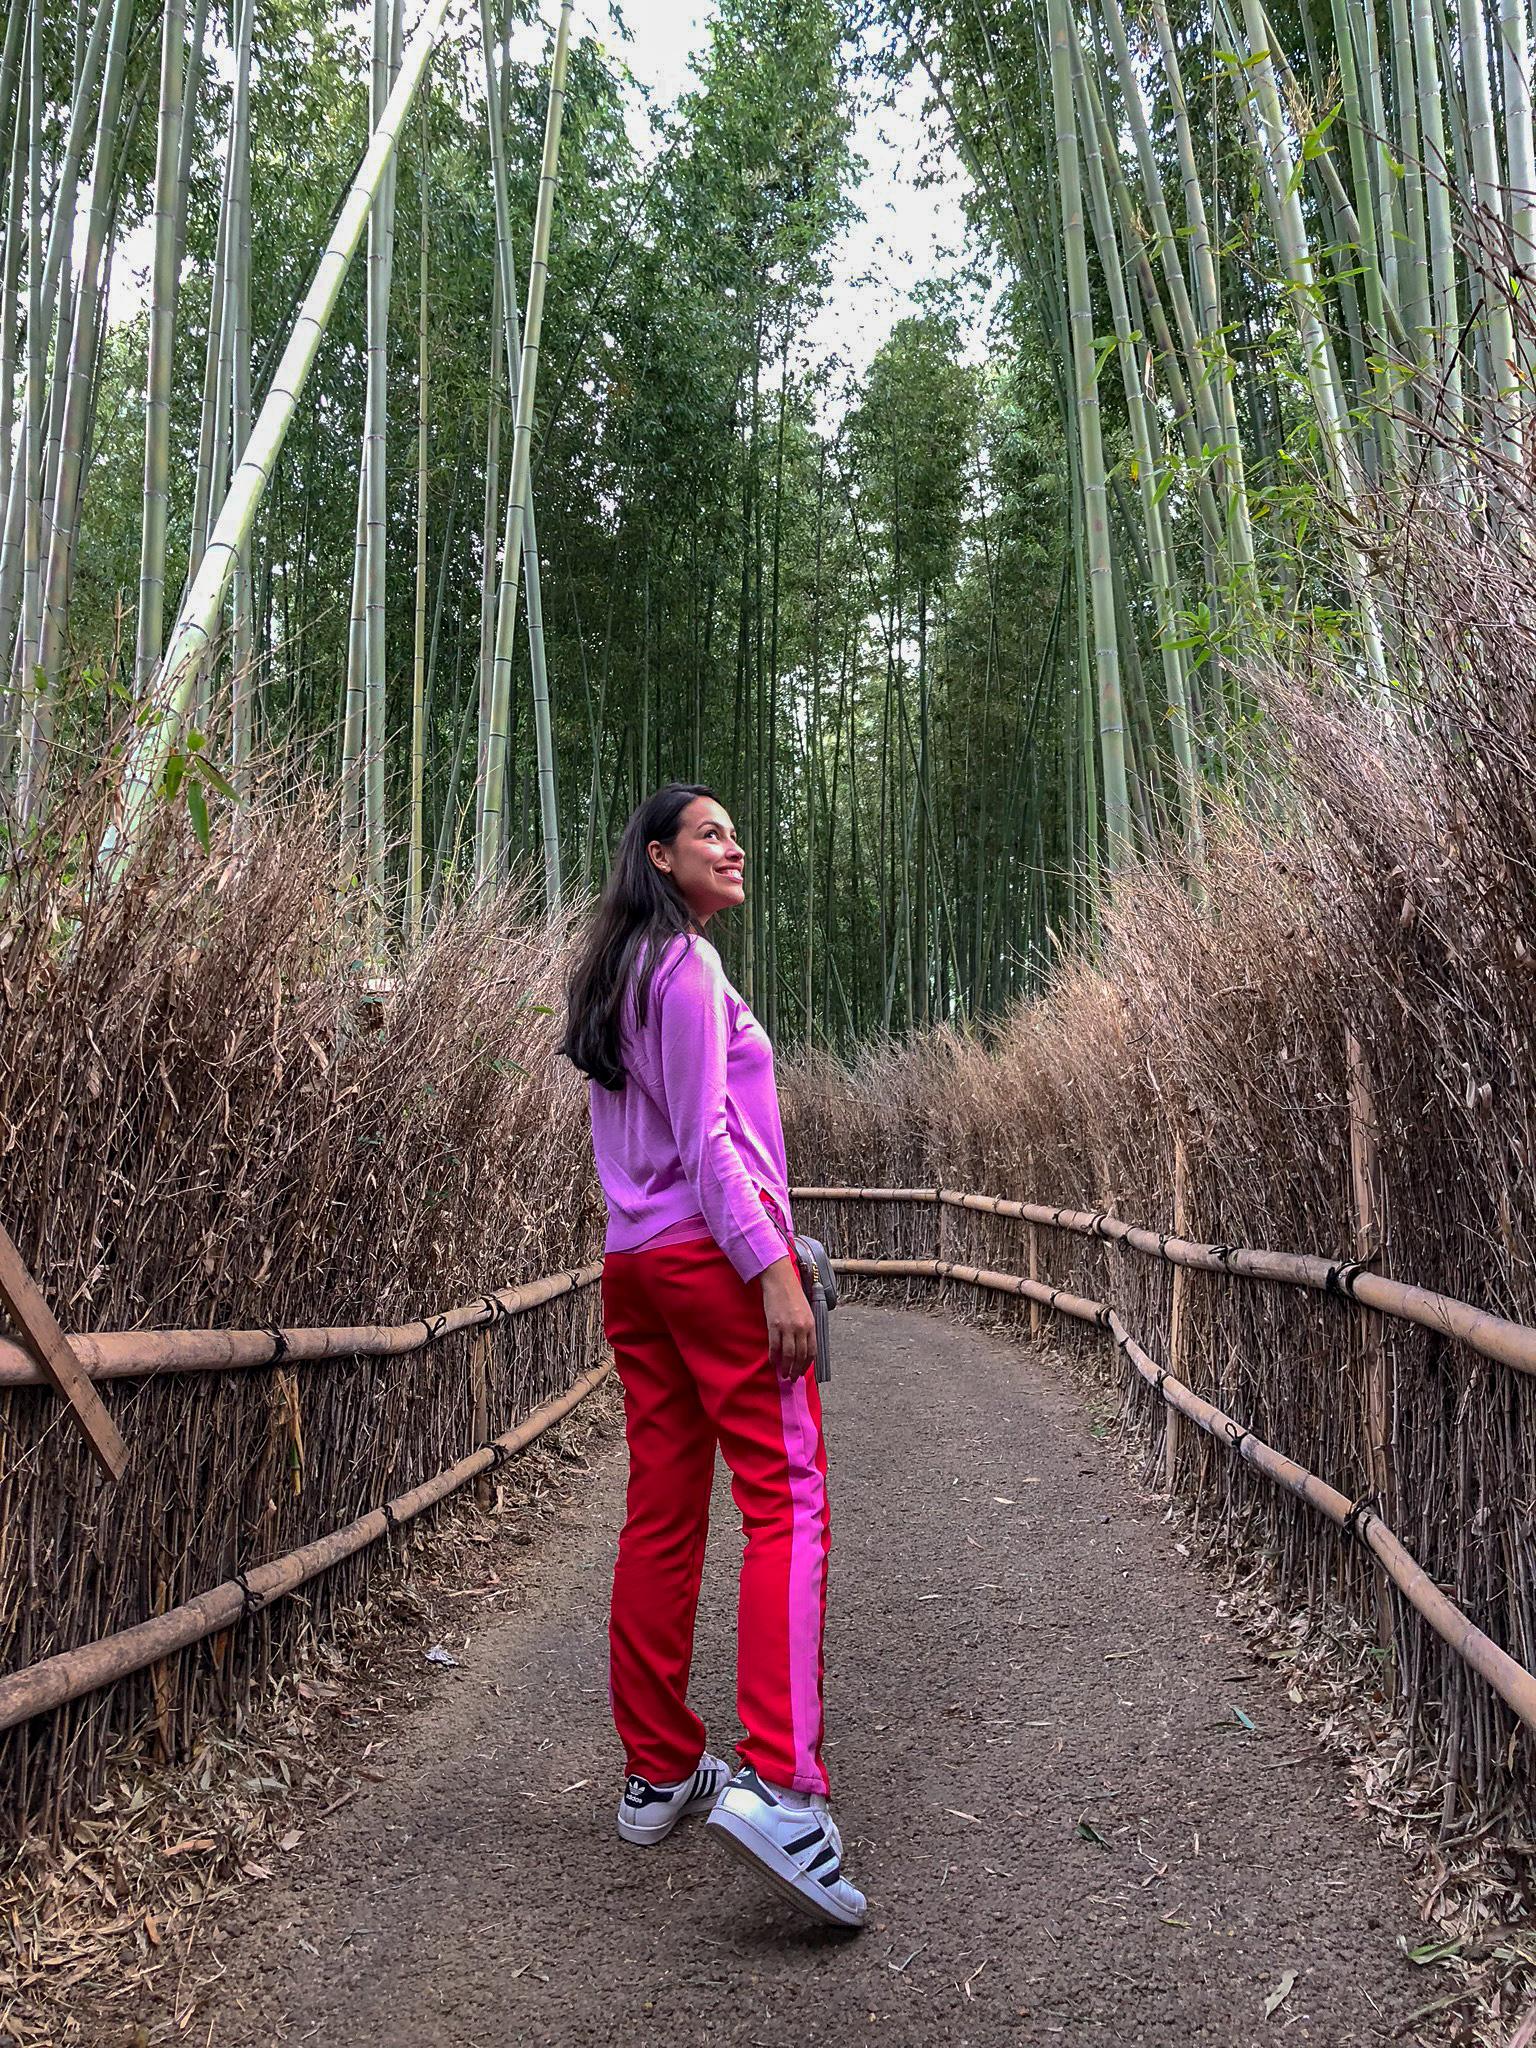 Arashiyama_floresta_de_bambu_kyoto